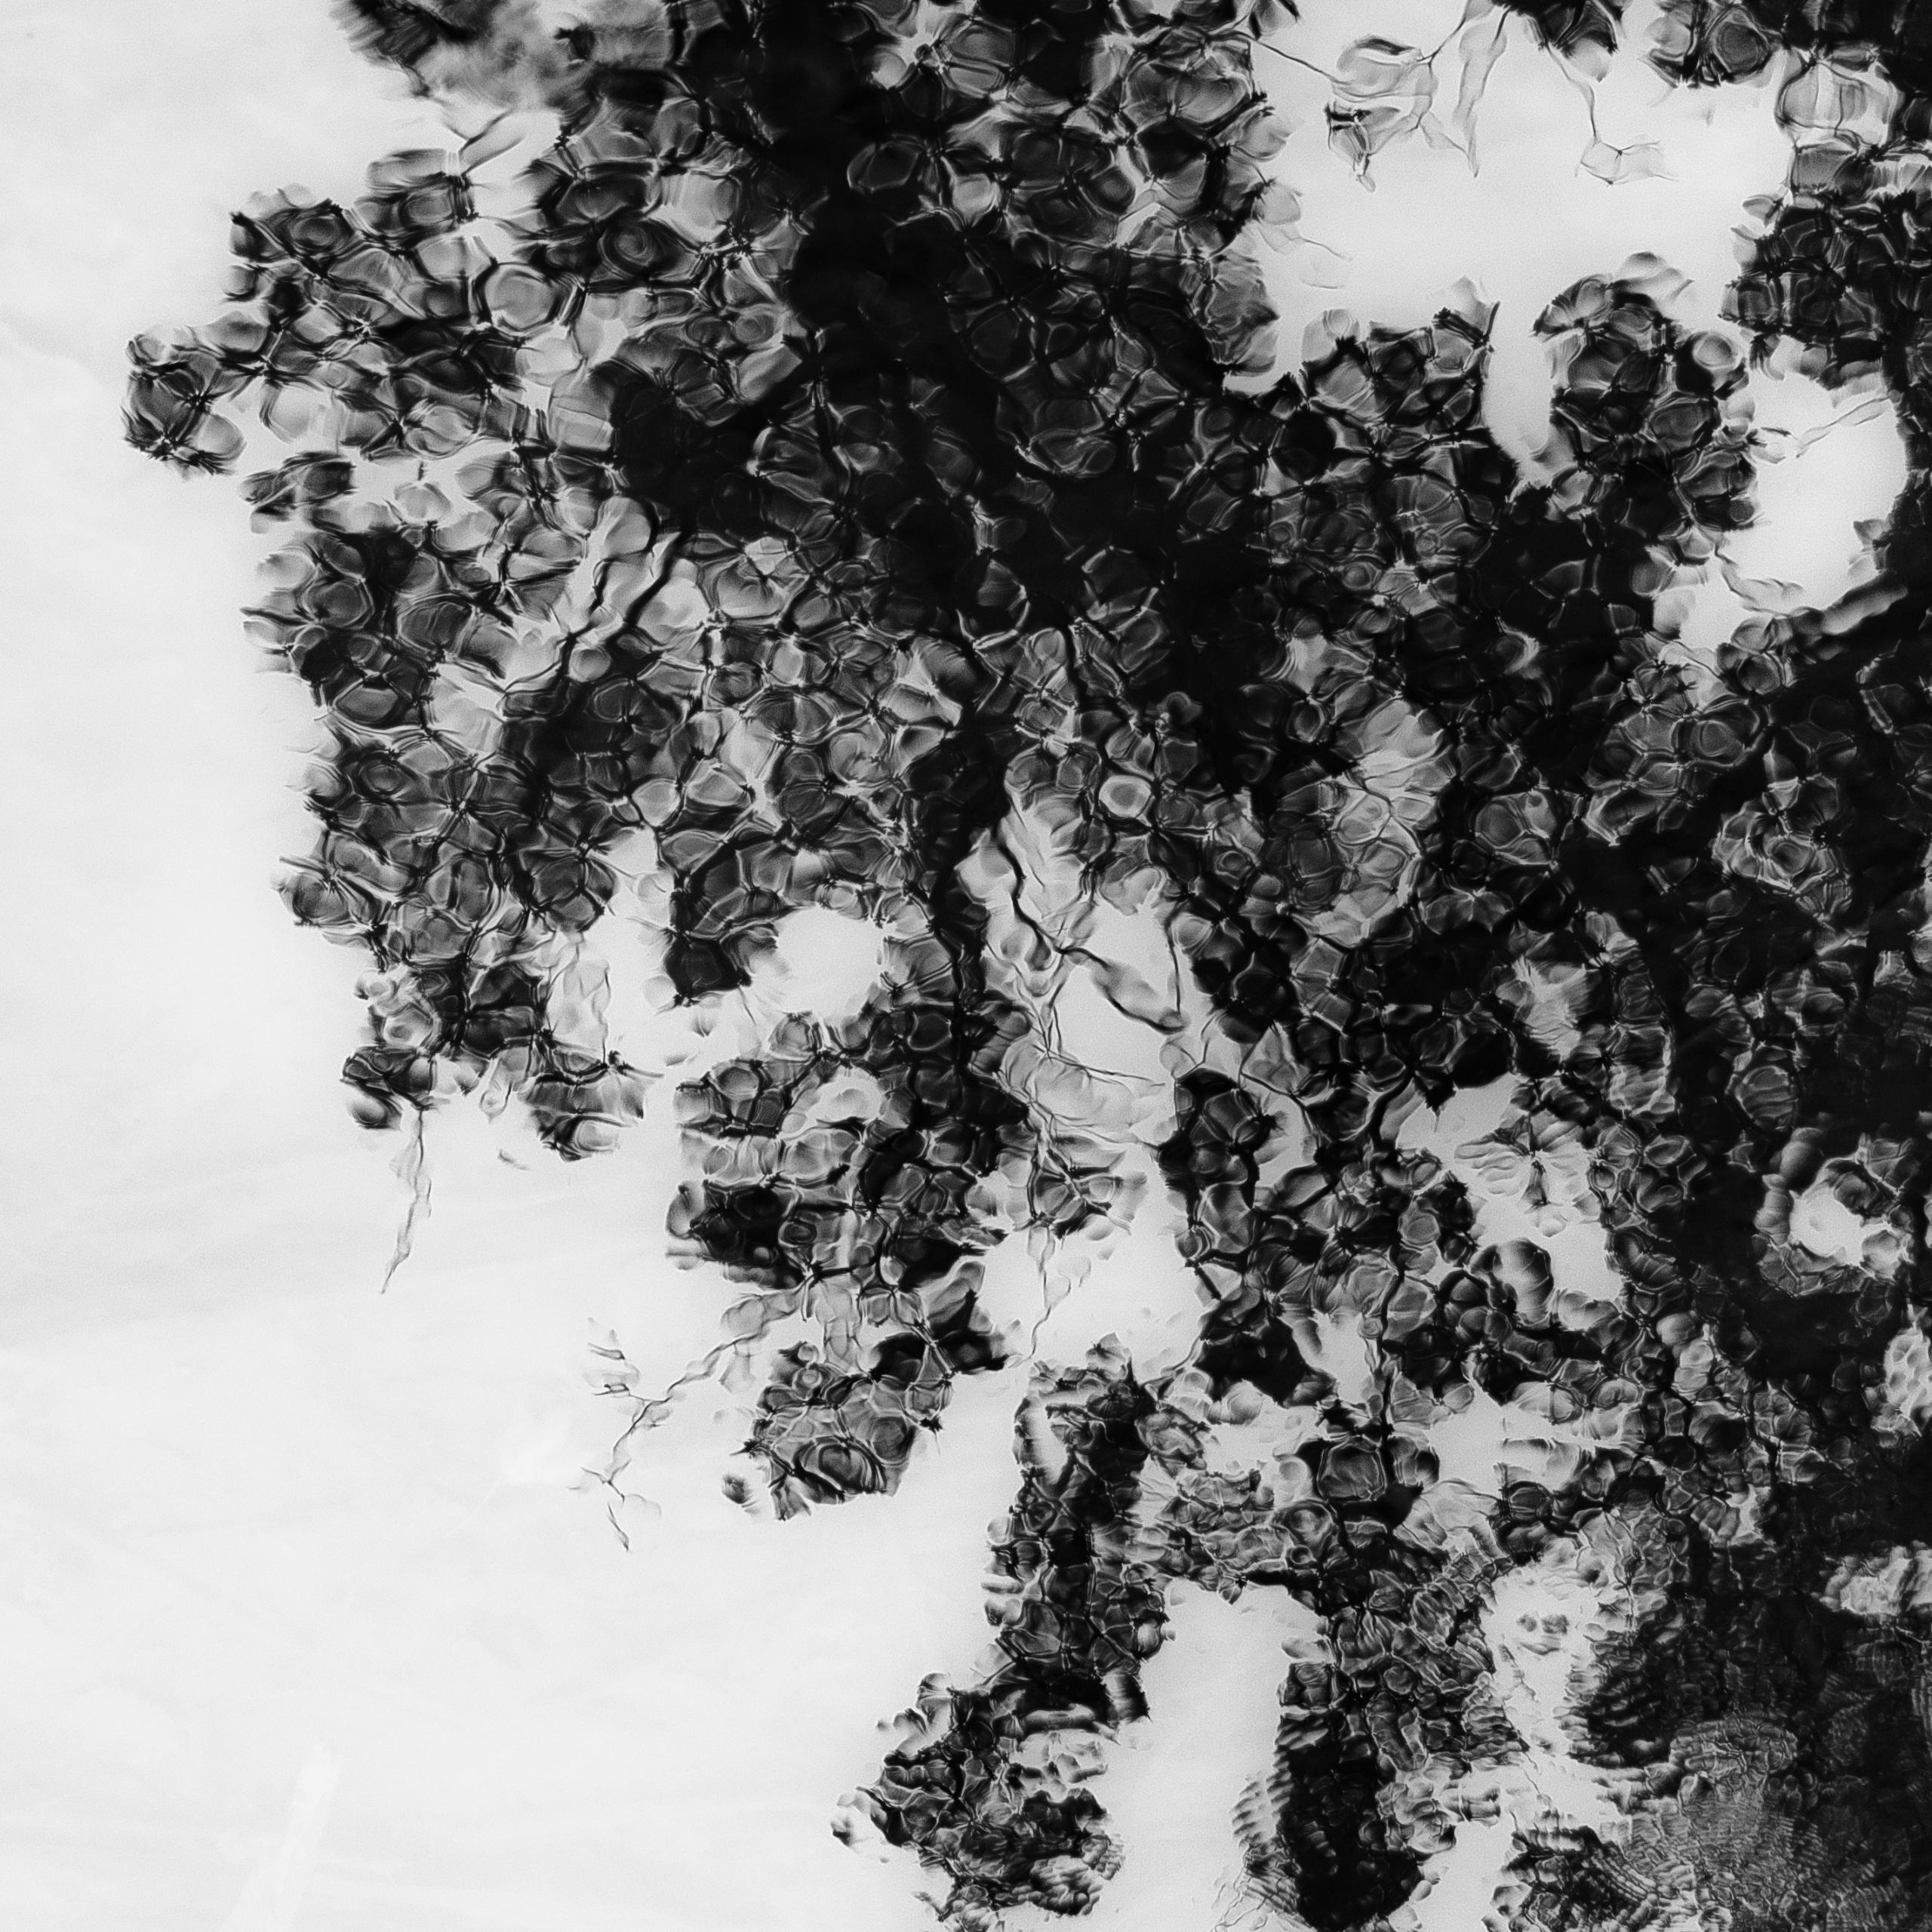 Trees Water 170 - noahbw | ello